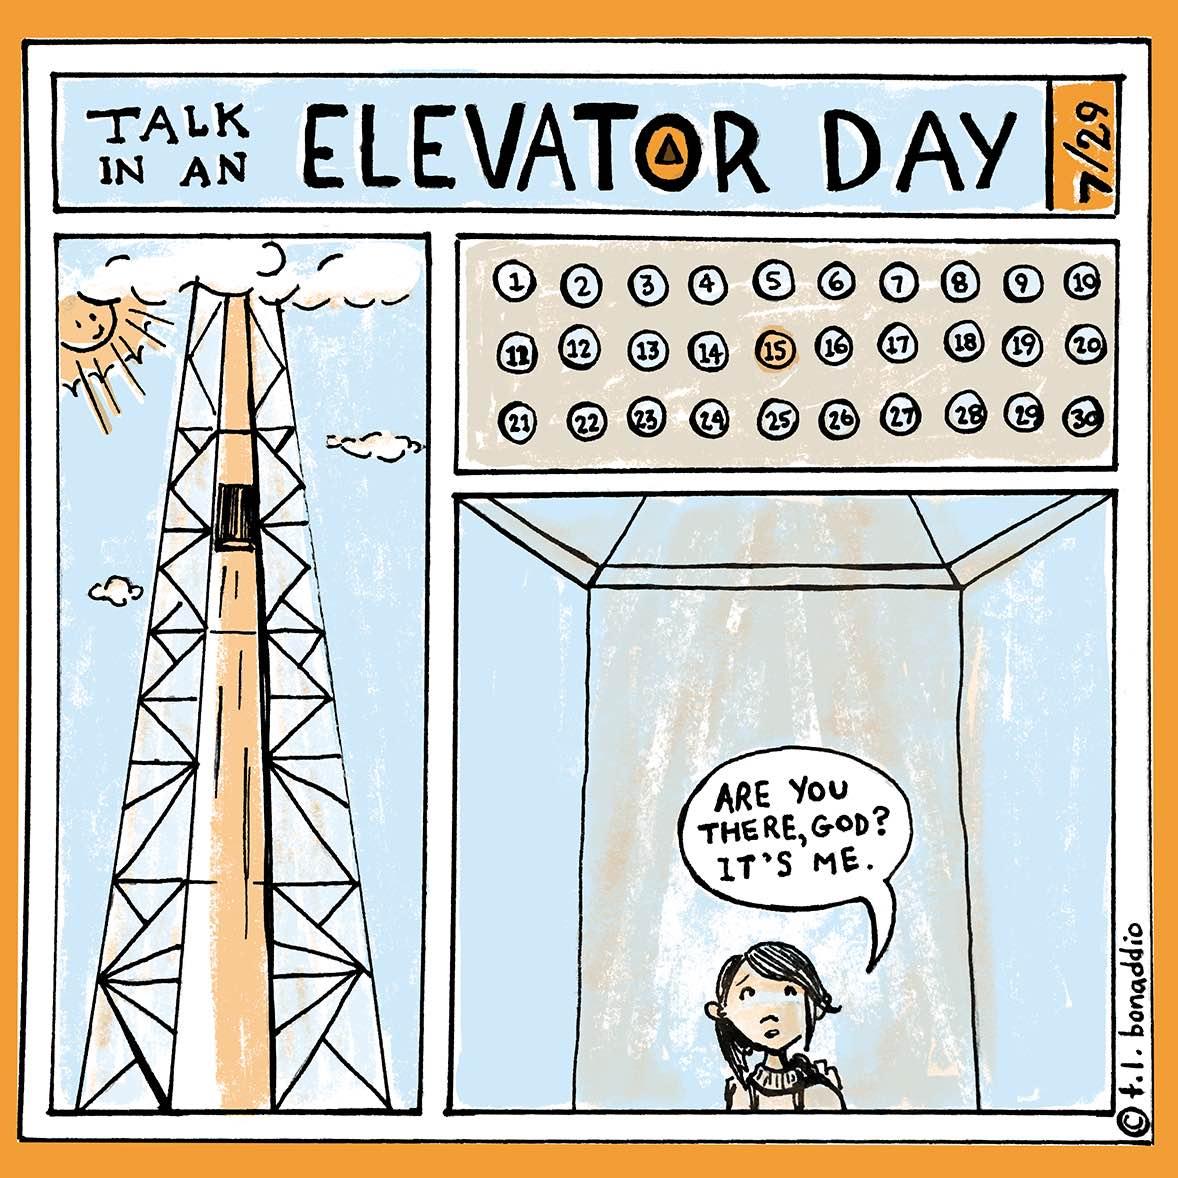 07-29_talk_in_an_elevator.jpg